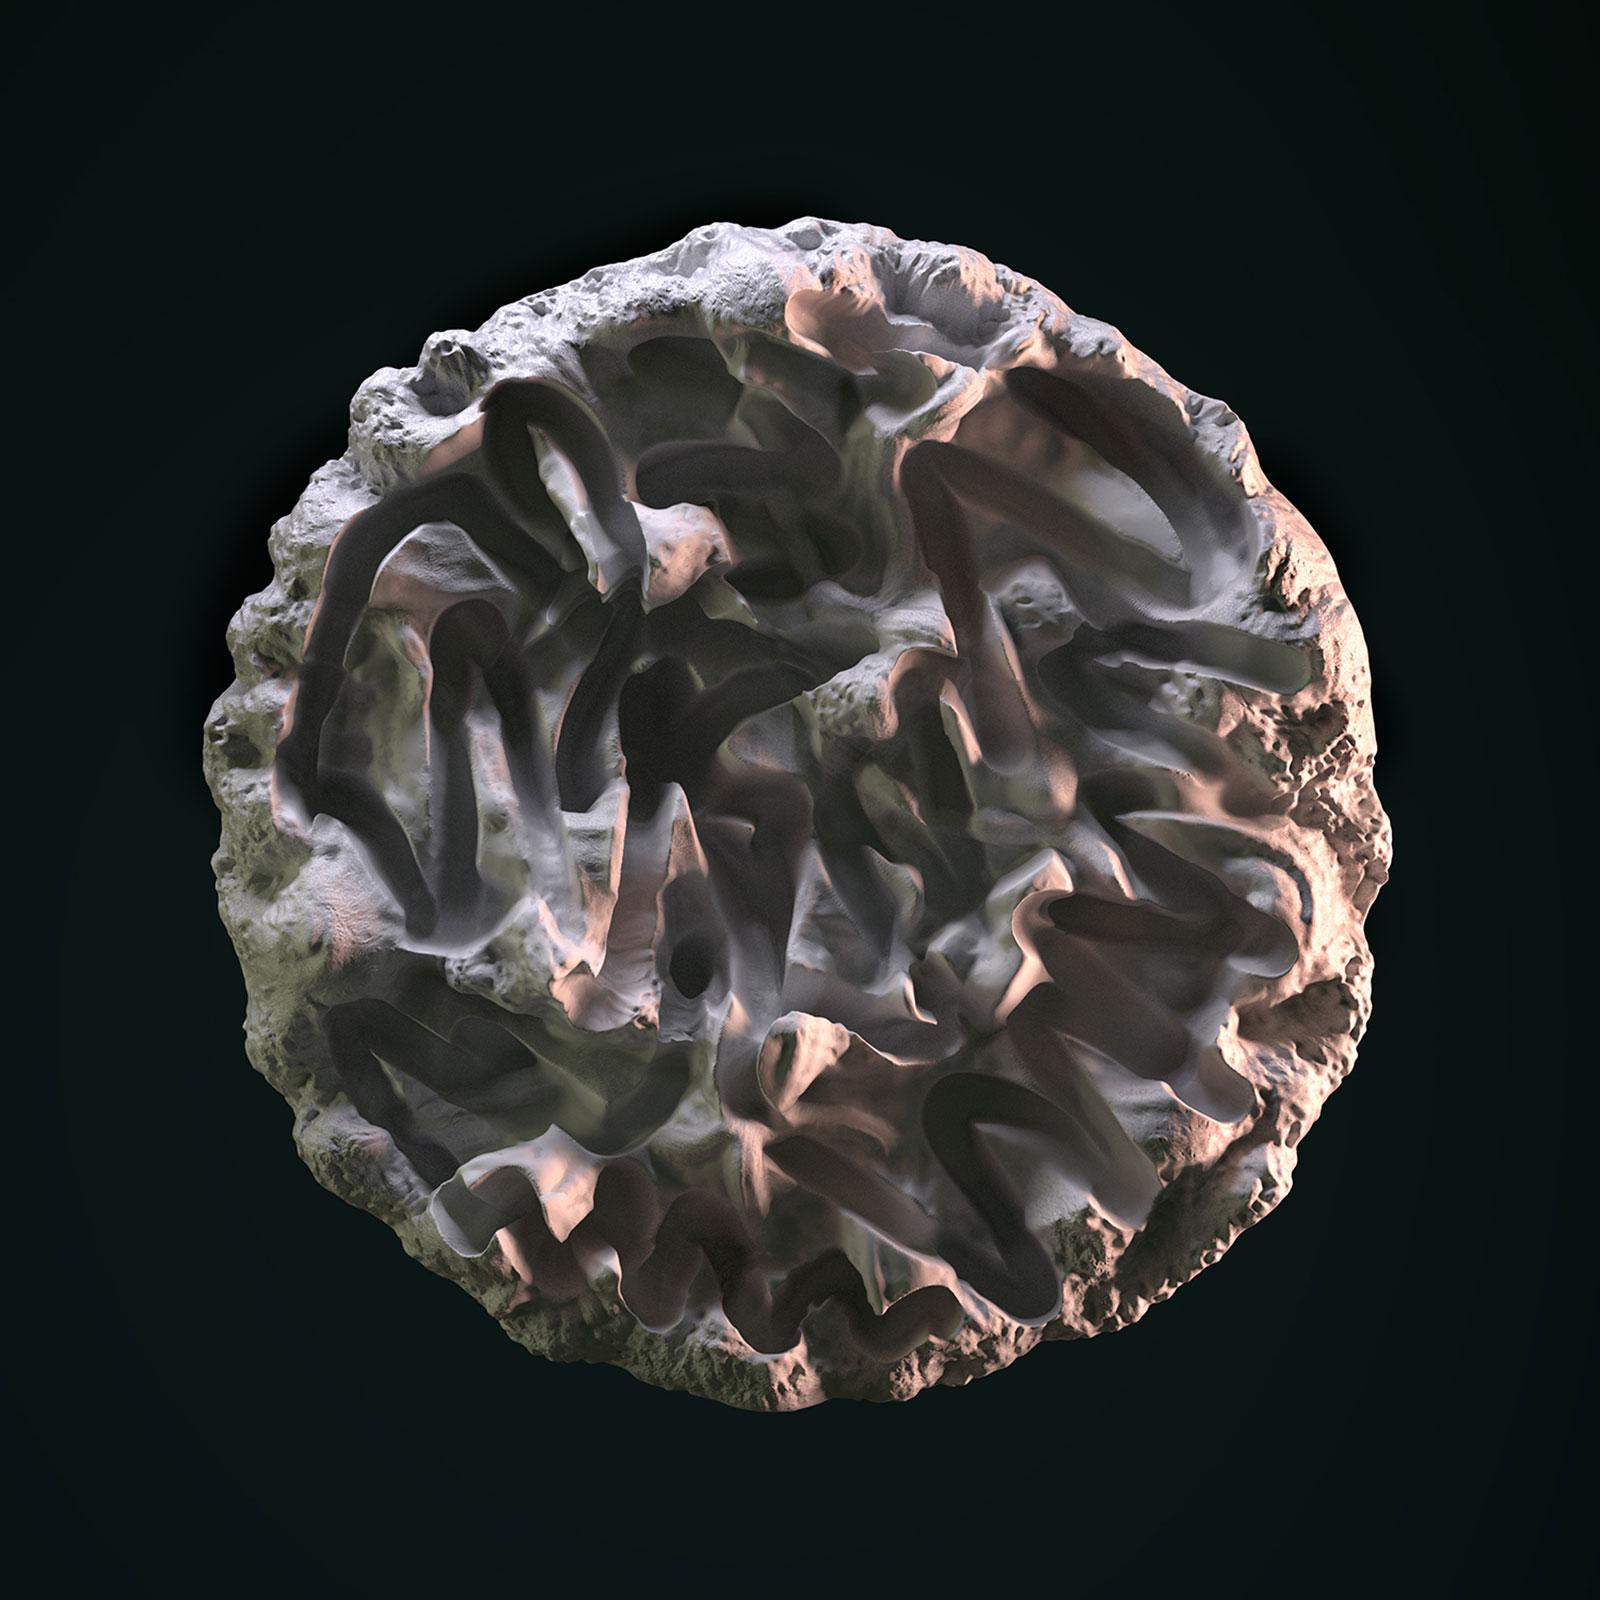 Surface I 03, CGI Fine Art Print, 110 x 110 cm, 2012